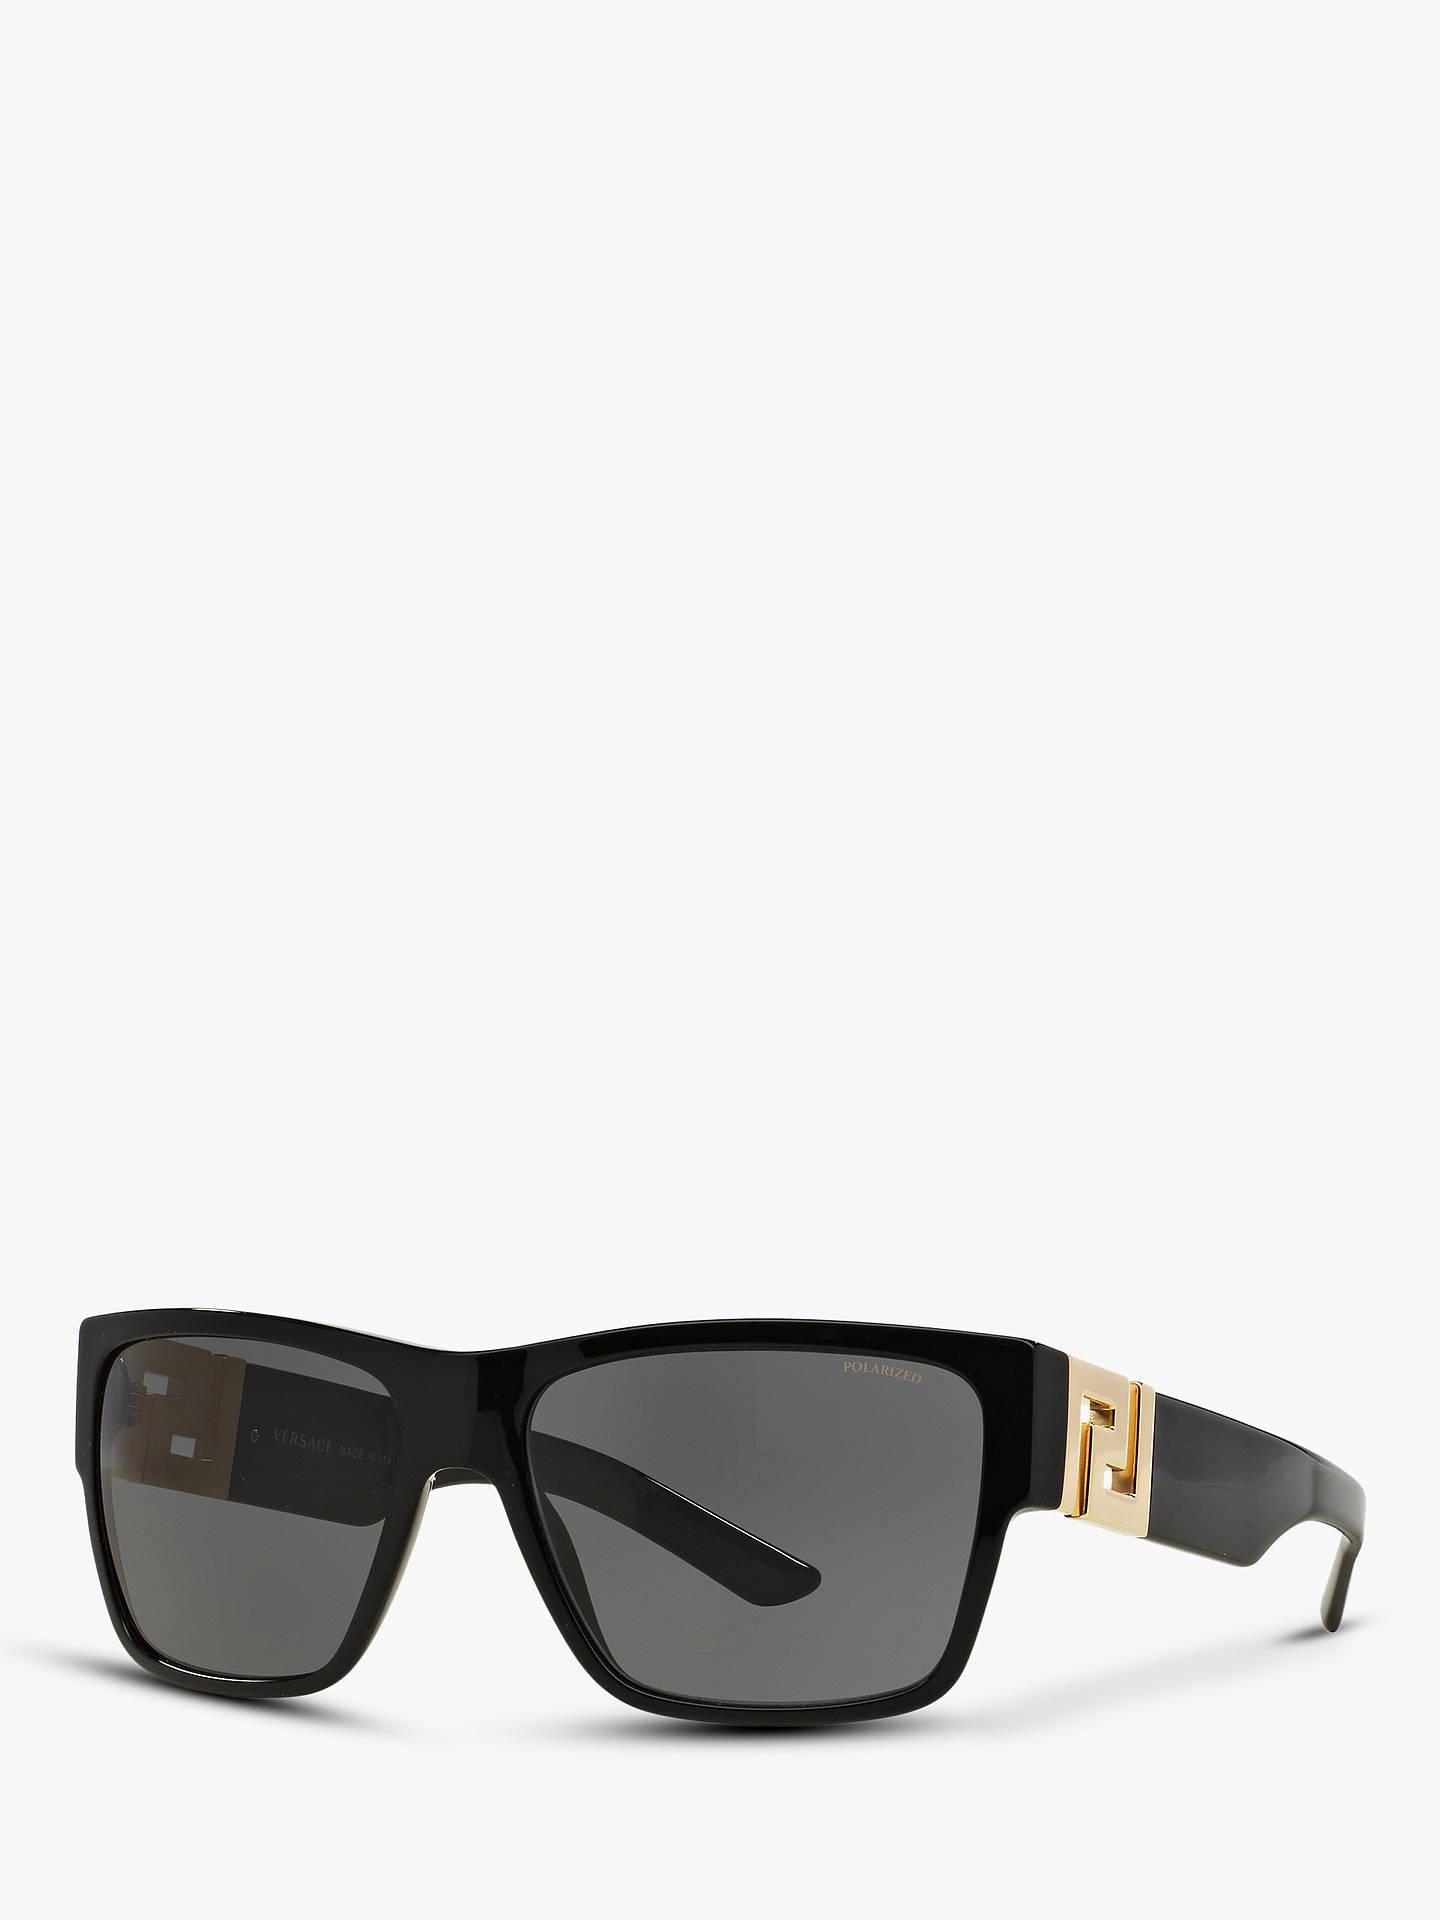 33de5854a1a8 Buy Versace VE4296 Men's Polarised Square Sunglasses, Black/Grey Online at  johnlewis. ...